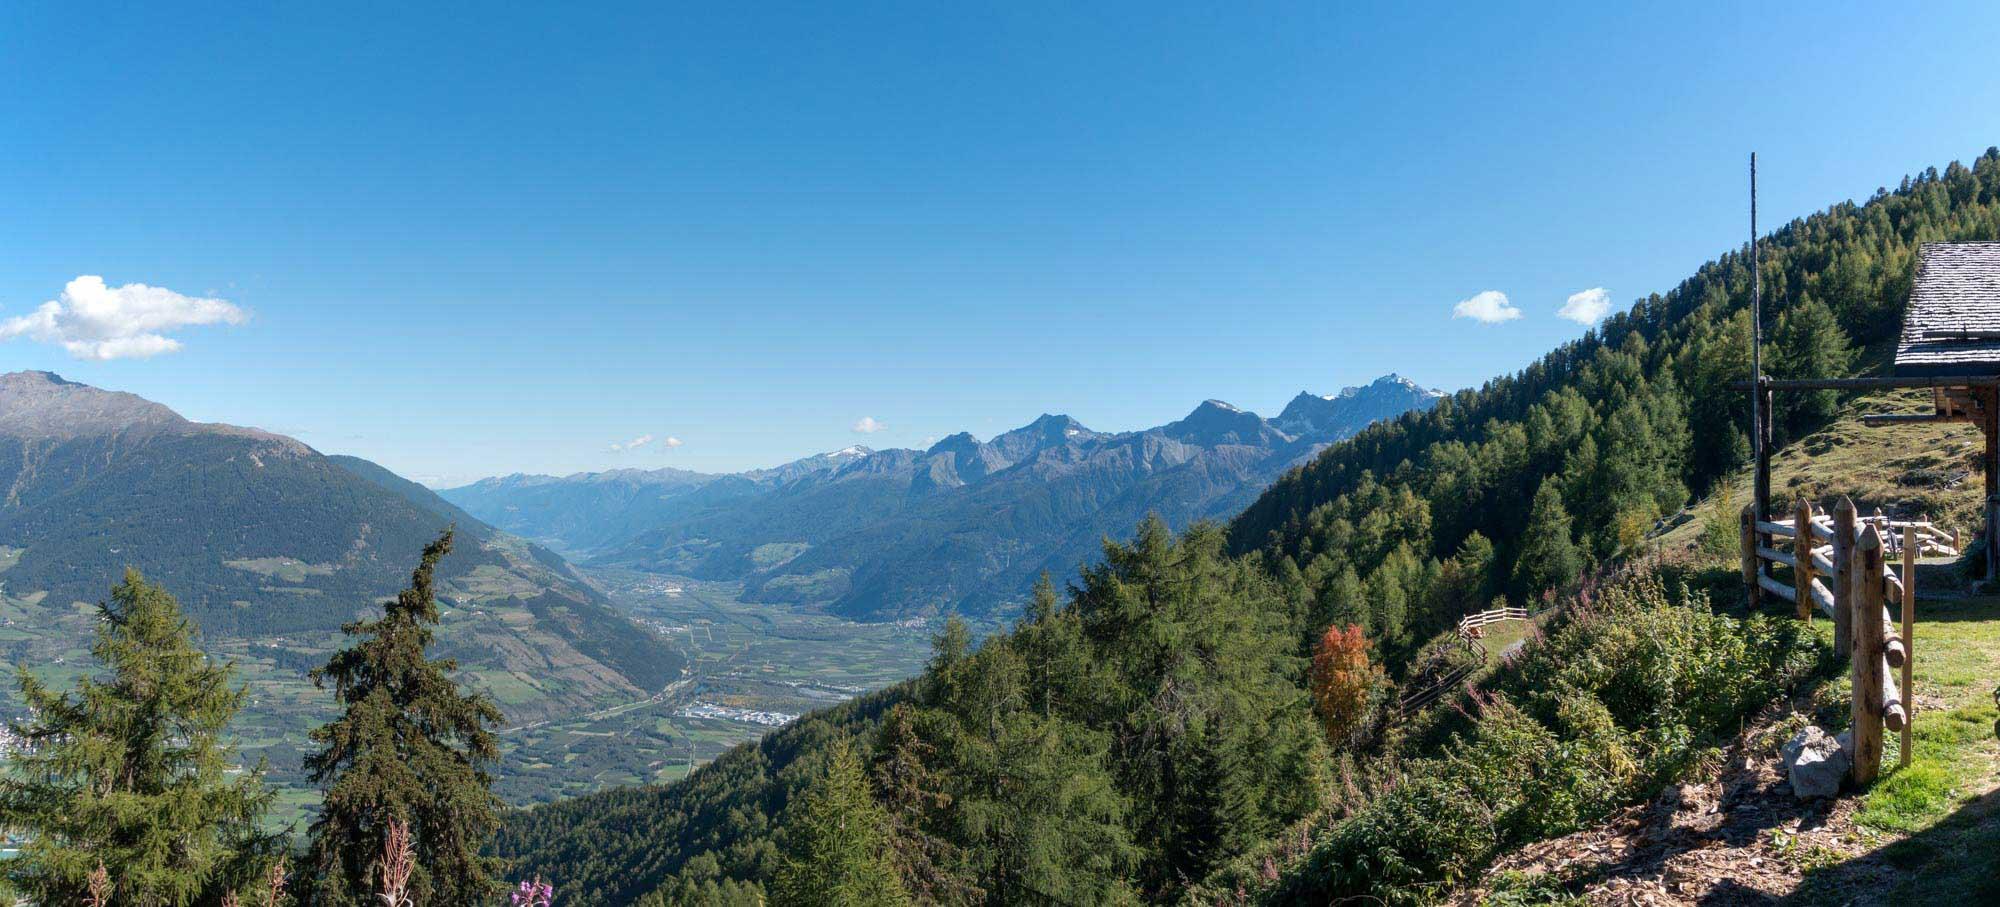 Mtb enkelt trail Tyrol